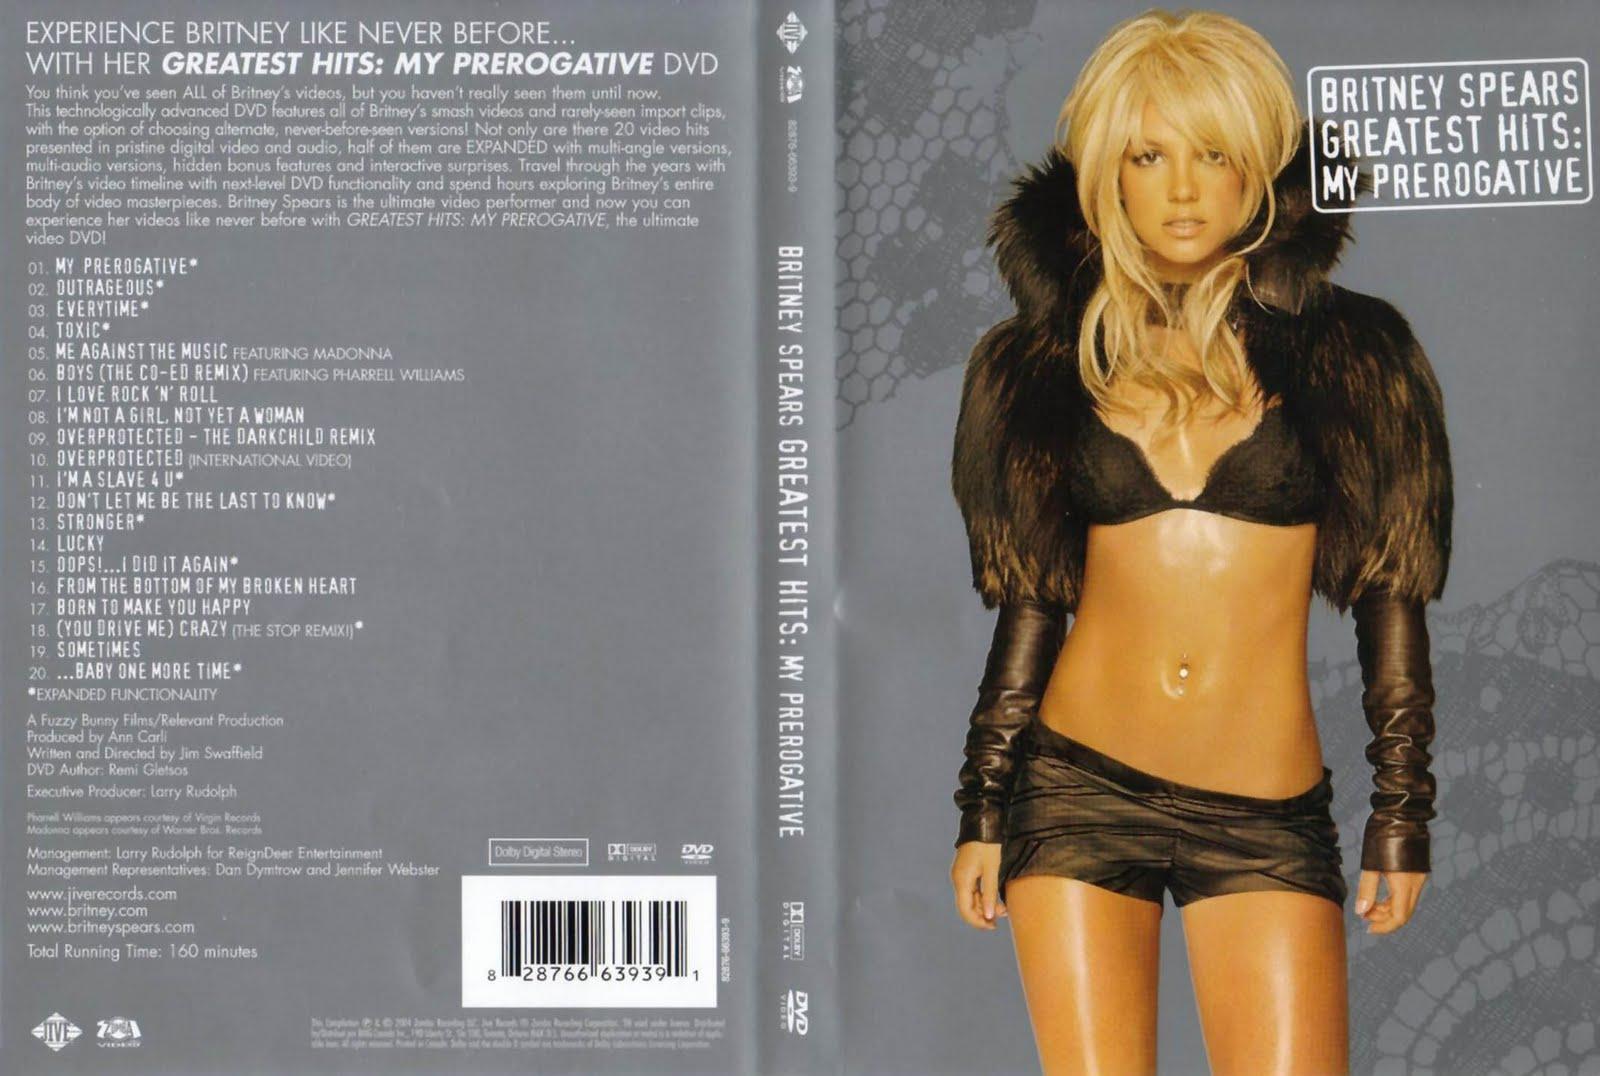 http://3.bp.blogspot.com/_9hpmRuuWki0/TNQ0PCGAHwI/AAAAAAAAAec/_Q4o1kkRGcg/s1600/Britney_Spears-Greatest_Hits_My_Prerogative_(Dvd)-Caratula.jpg